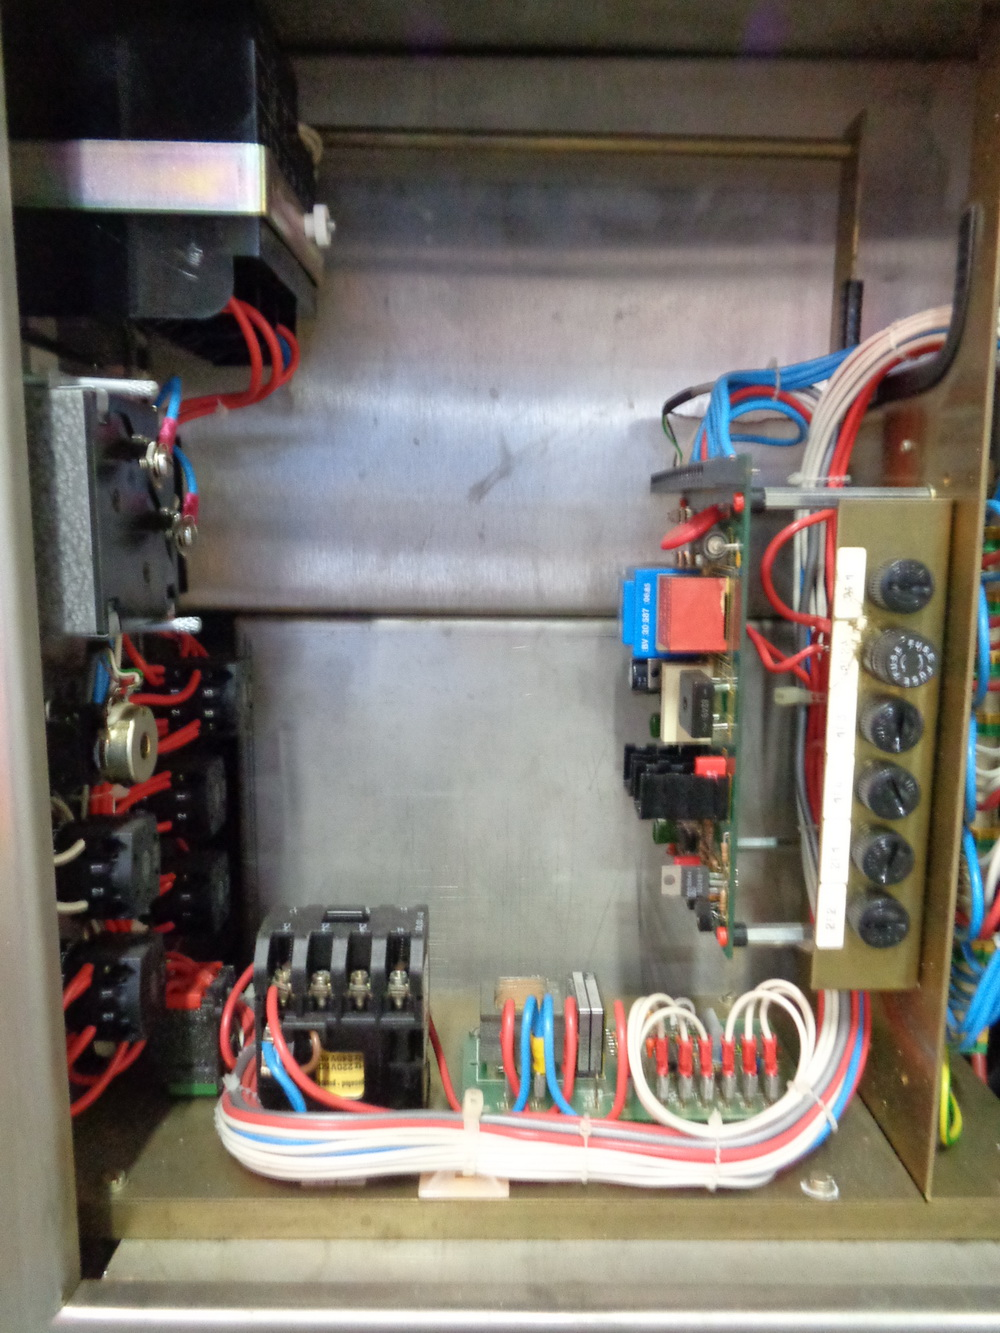 Haagen Rinau (Ekato) 1 gallon SS Vacuum/Jacketed Lab Process Mixer, Model Unimix, S/N 866-3276 - Image 9 of 10